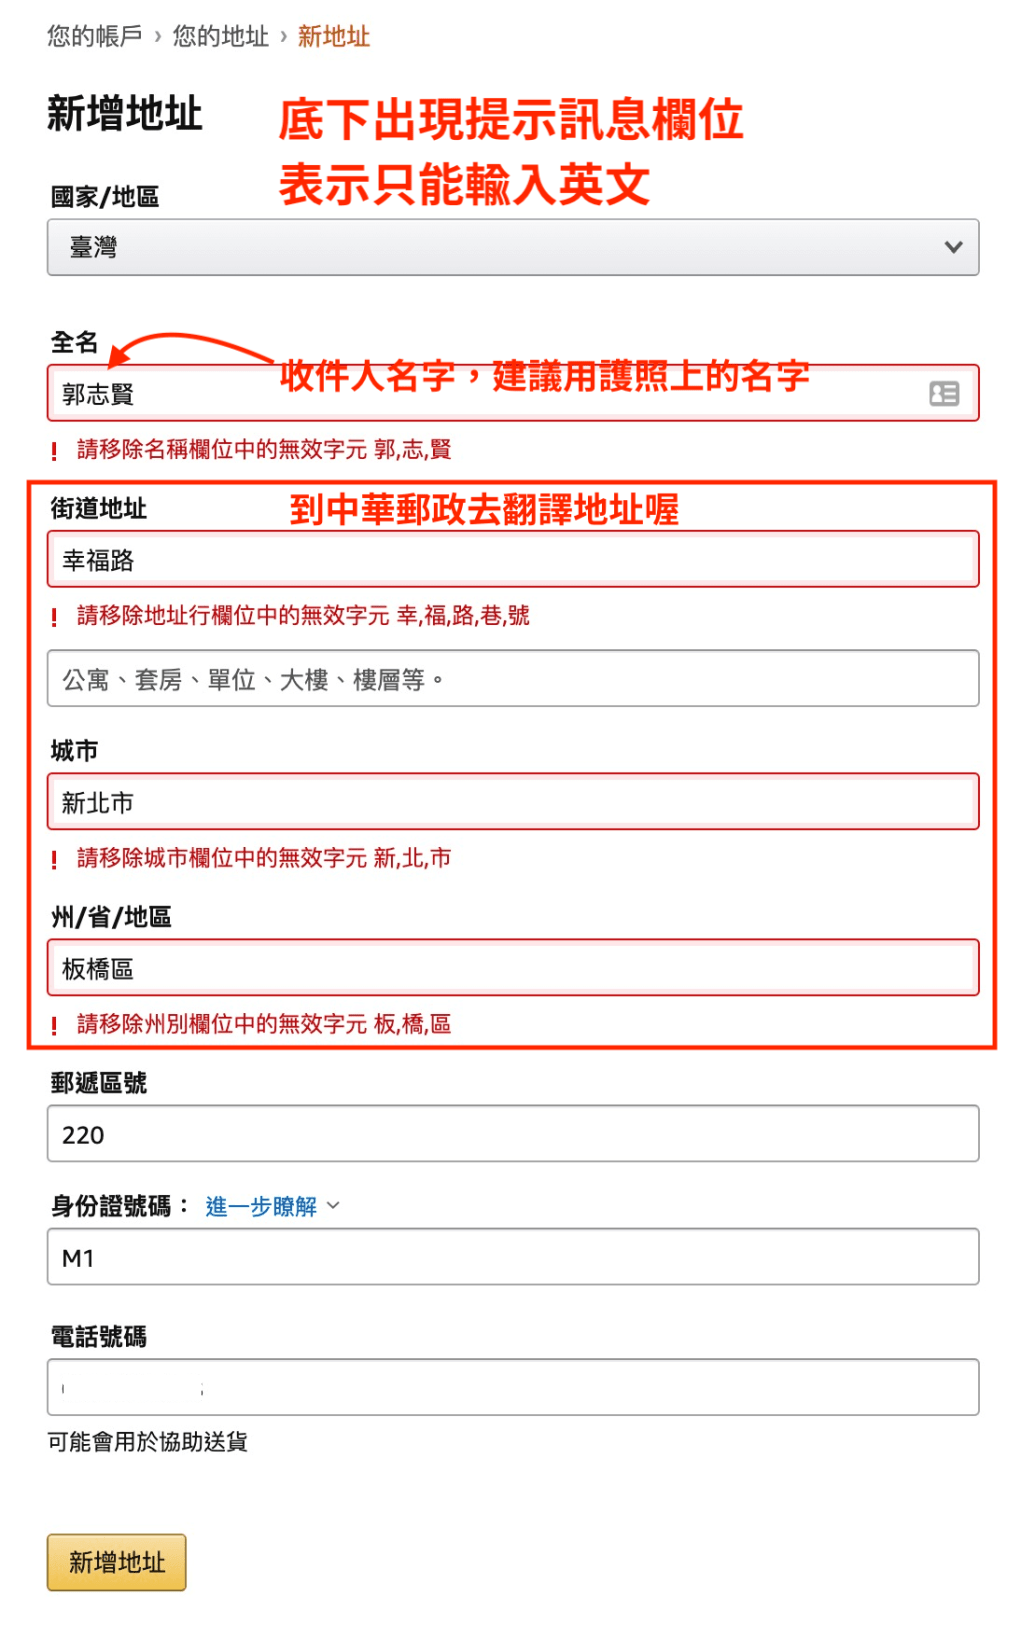 Amazon的收件人和地址,仍然無法使用中文字,名字建議用護照上的英文名字,地址所以還是需要到中華郵政去翻譯成英文地址喔!